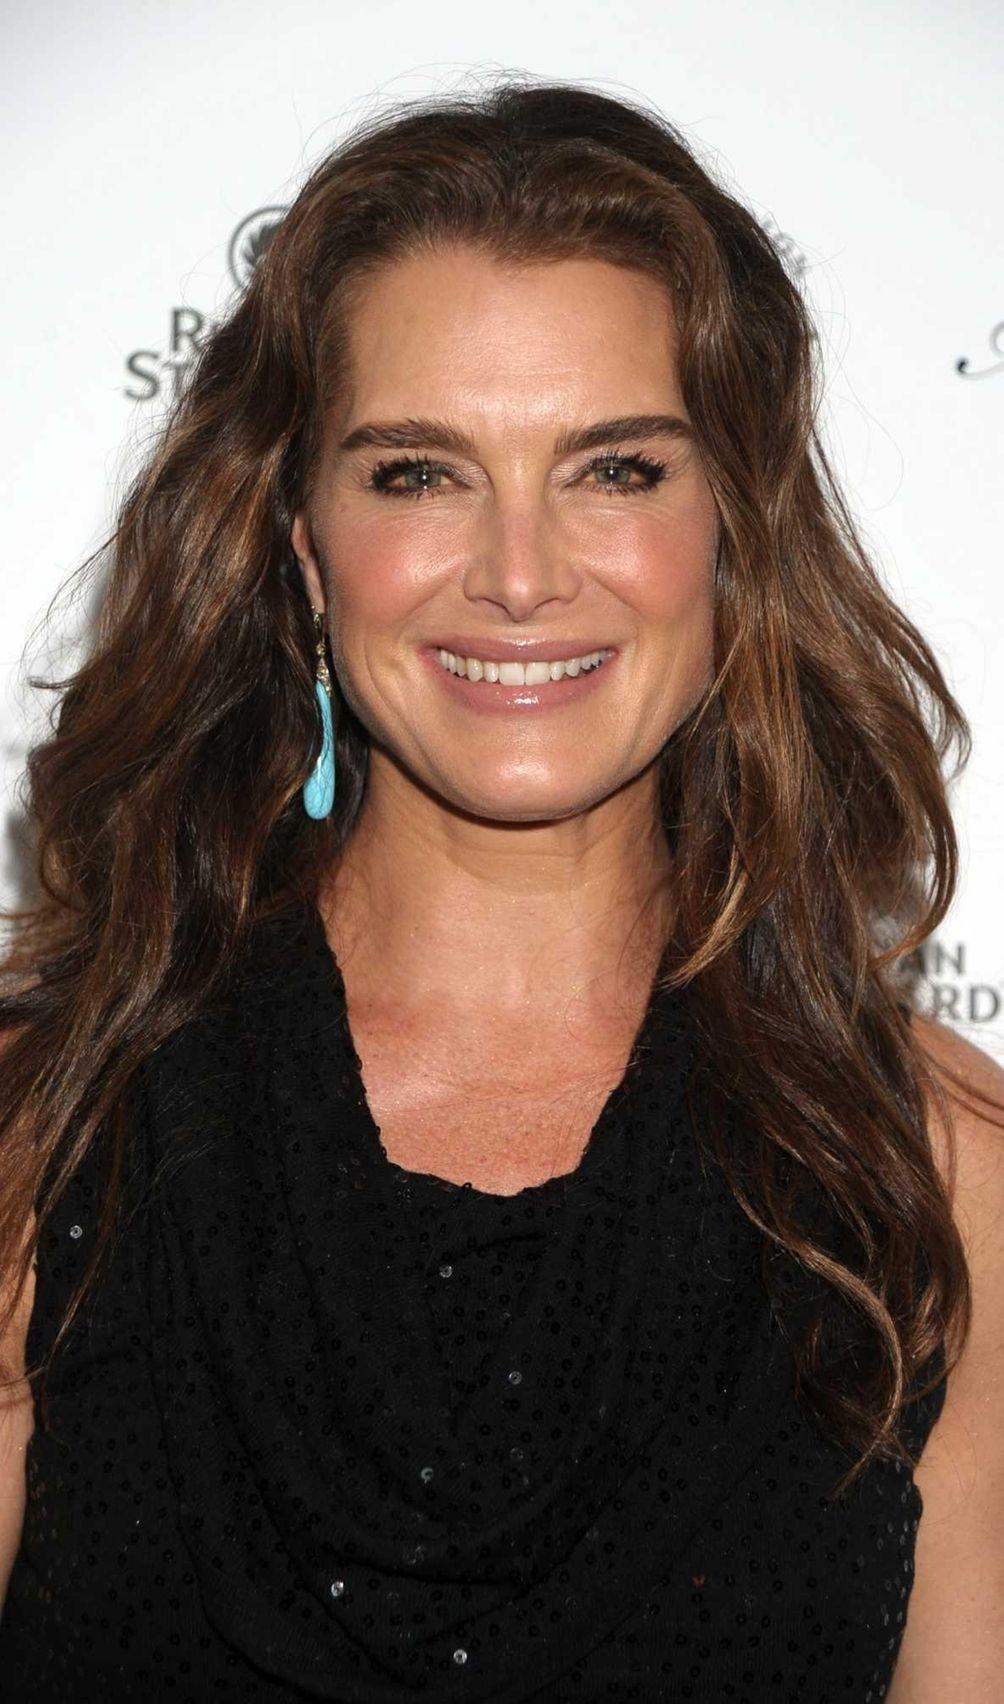 Brooke Shields attends the Hampton Magazine's annual Memorial